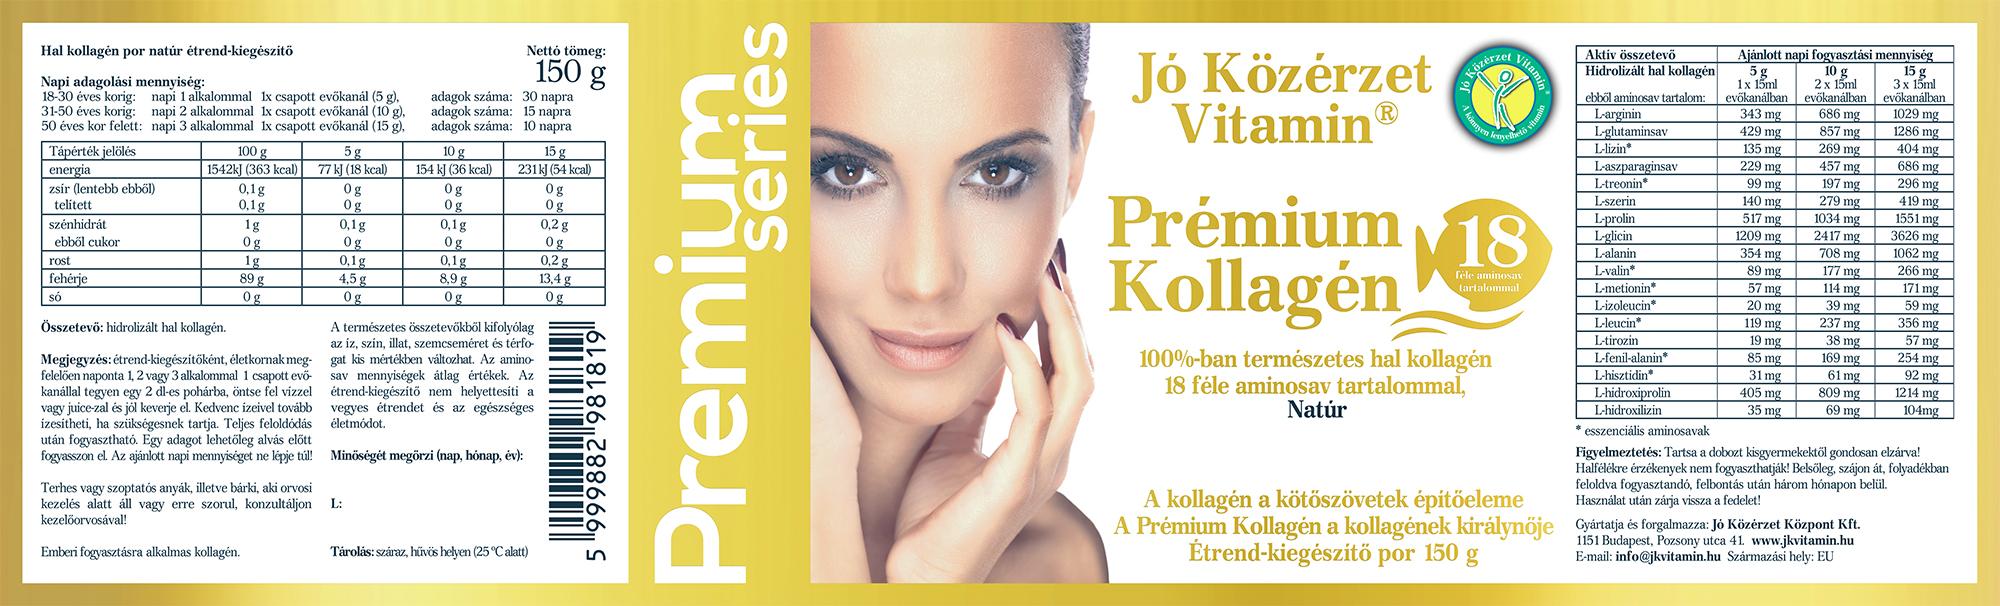 Premium Series Prémium Kollagén Natúr címke